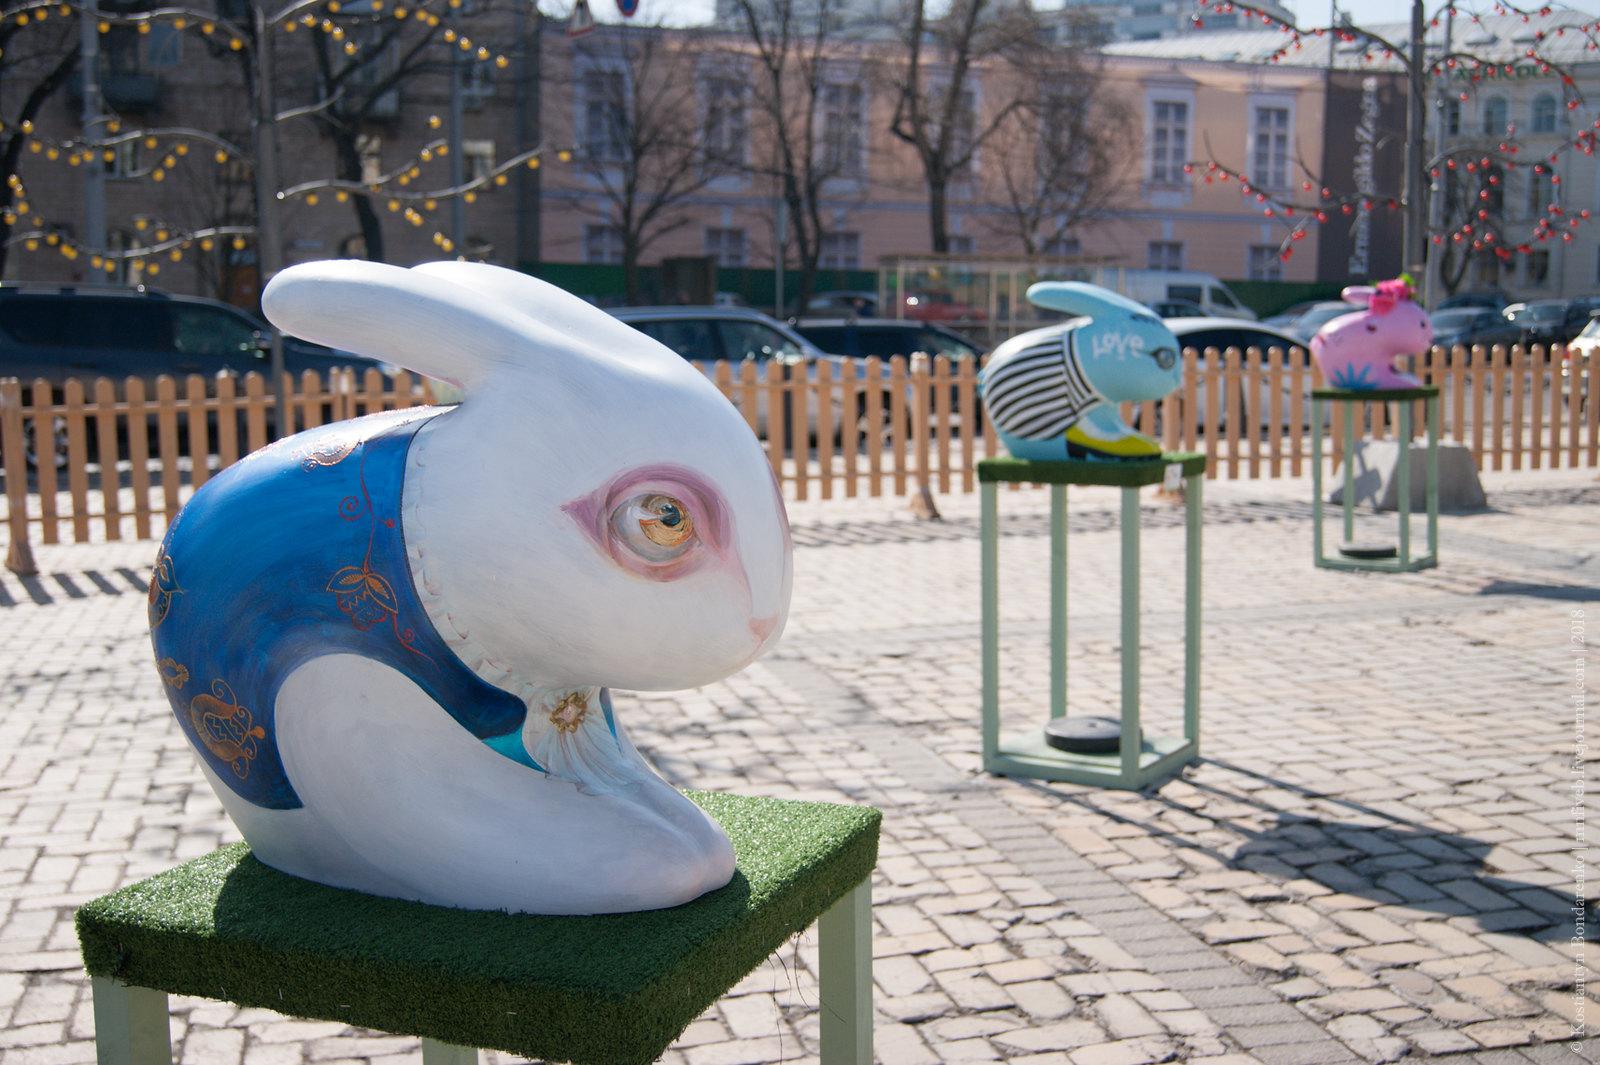 201804010 - Easter-21